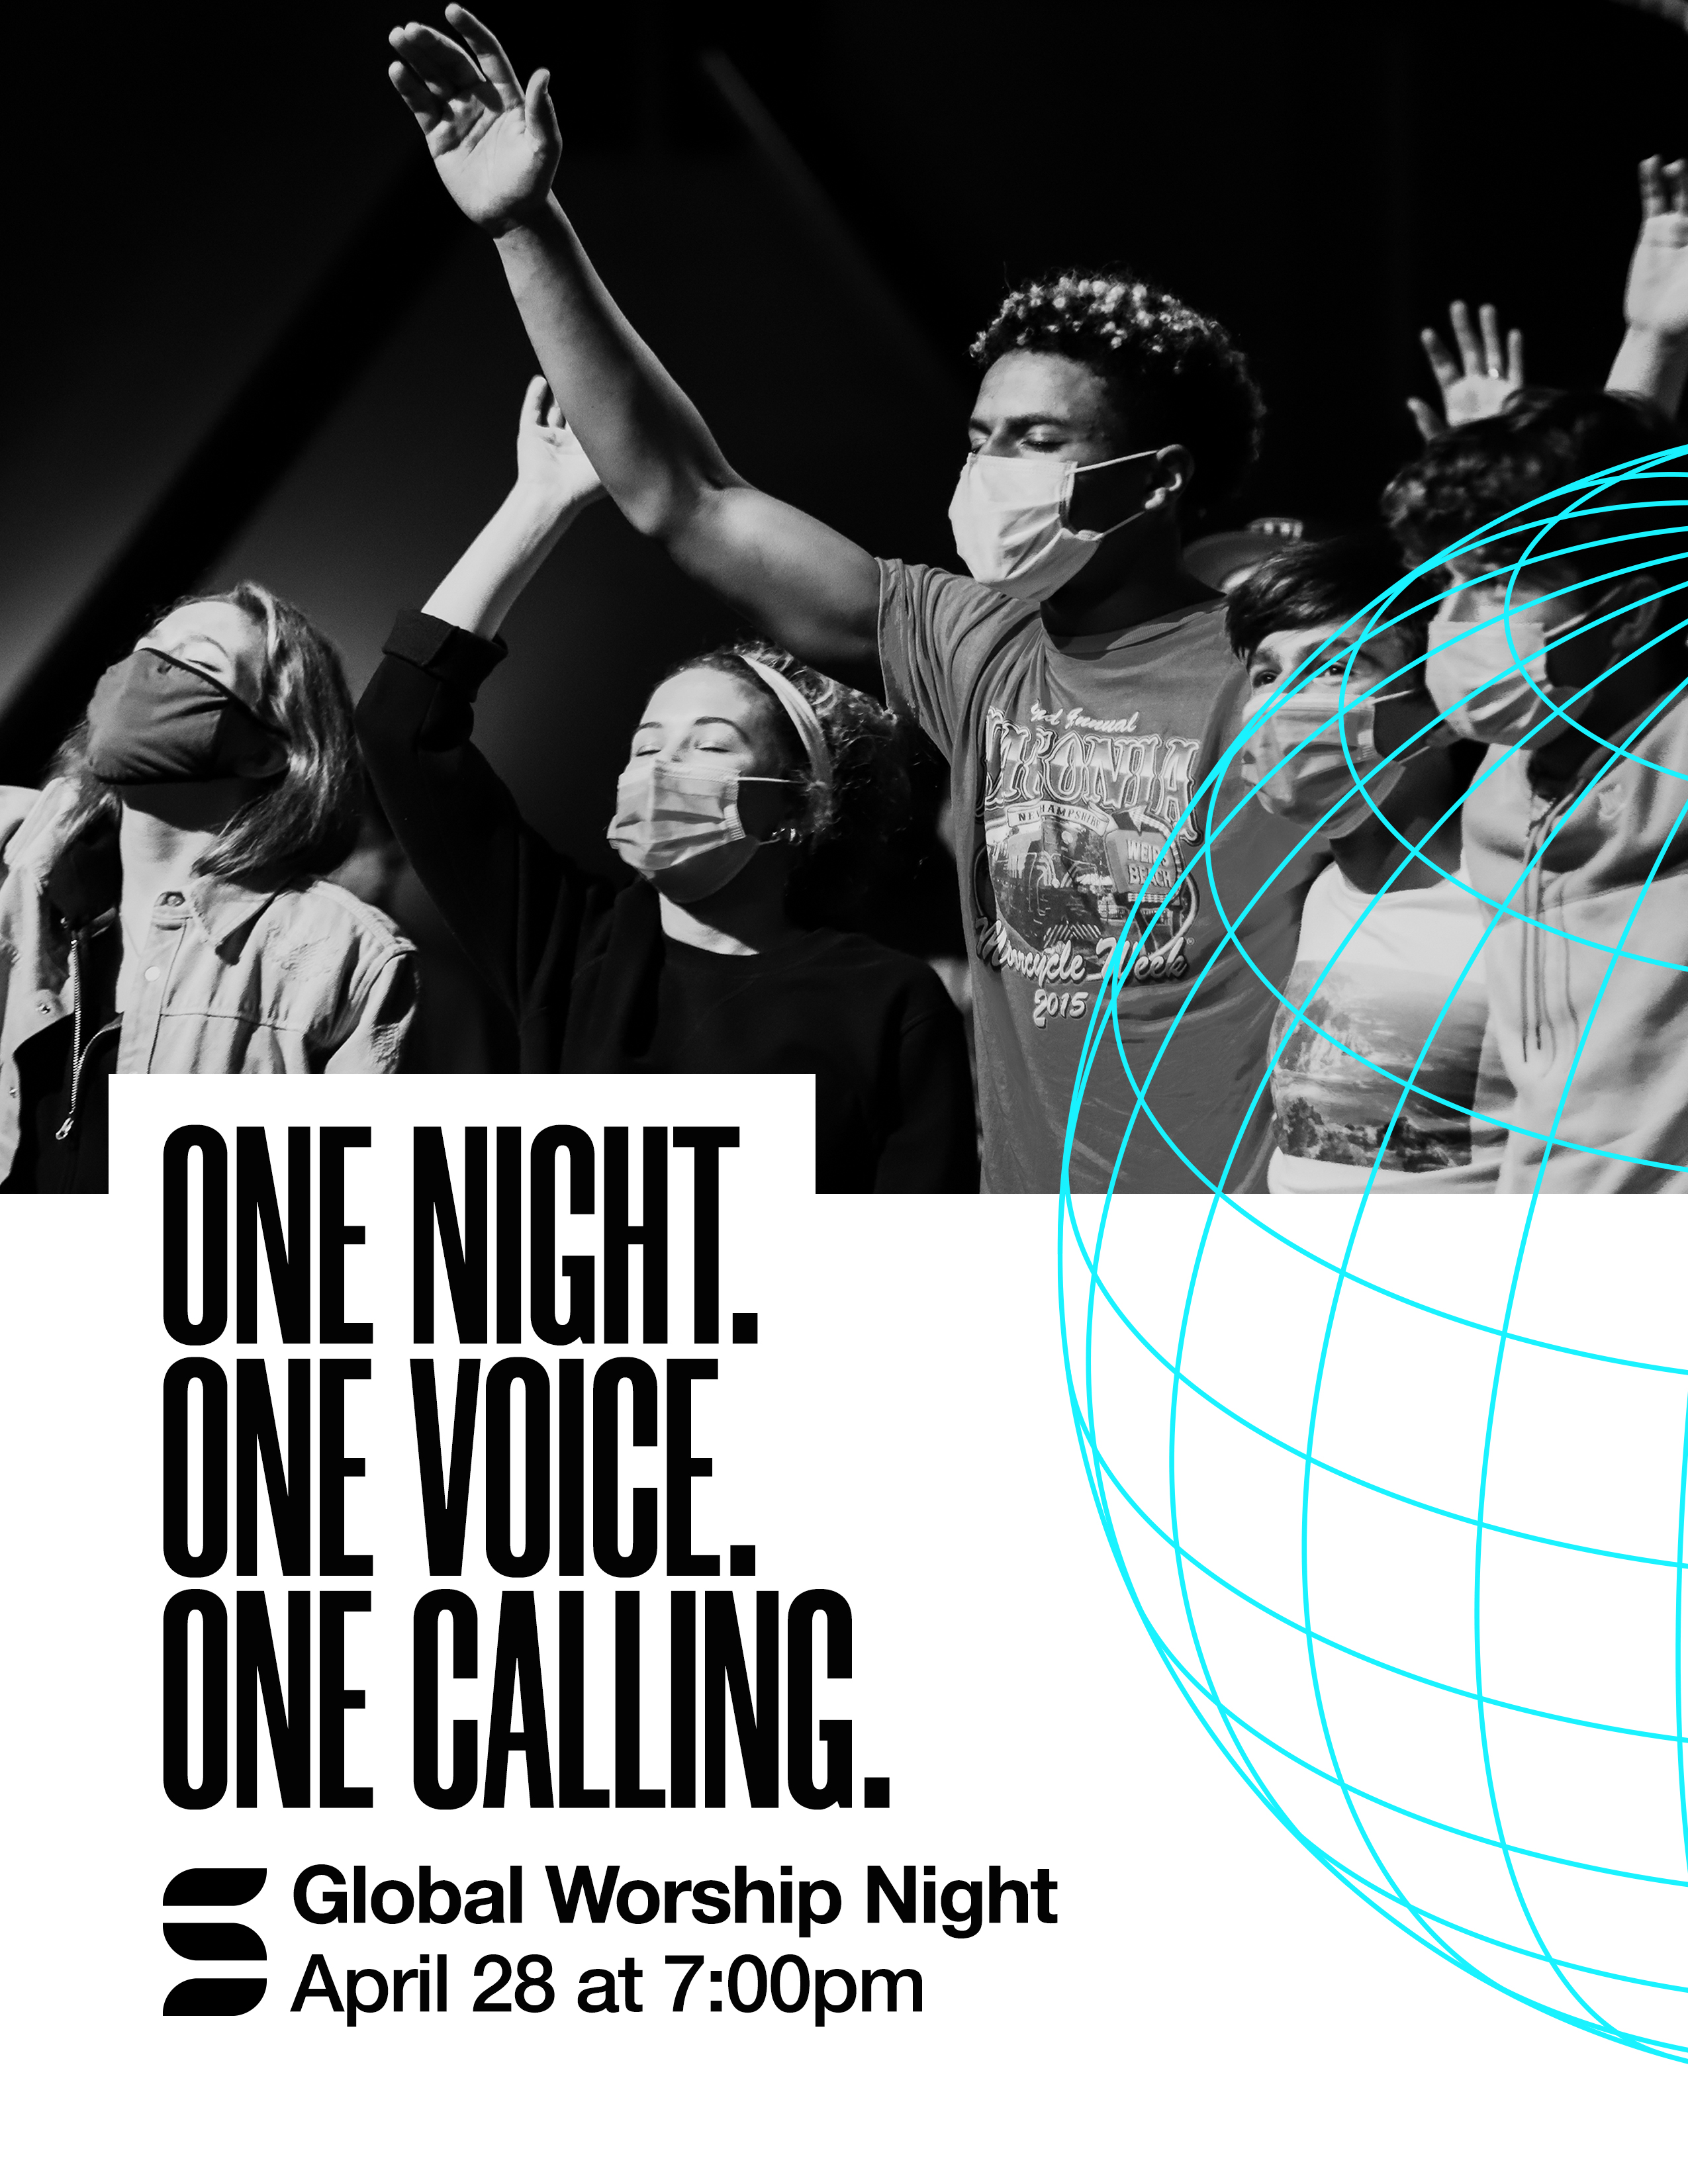 Worship Night Signage - Full (JPG)